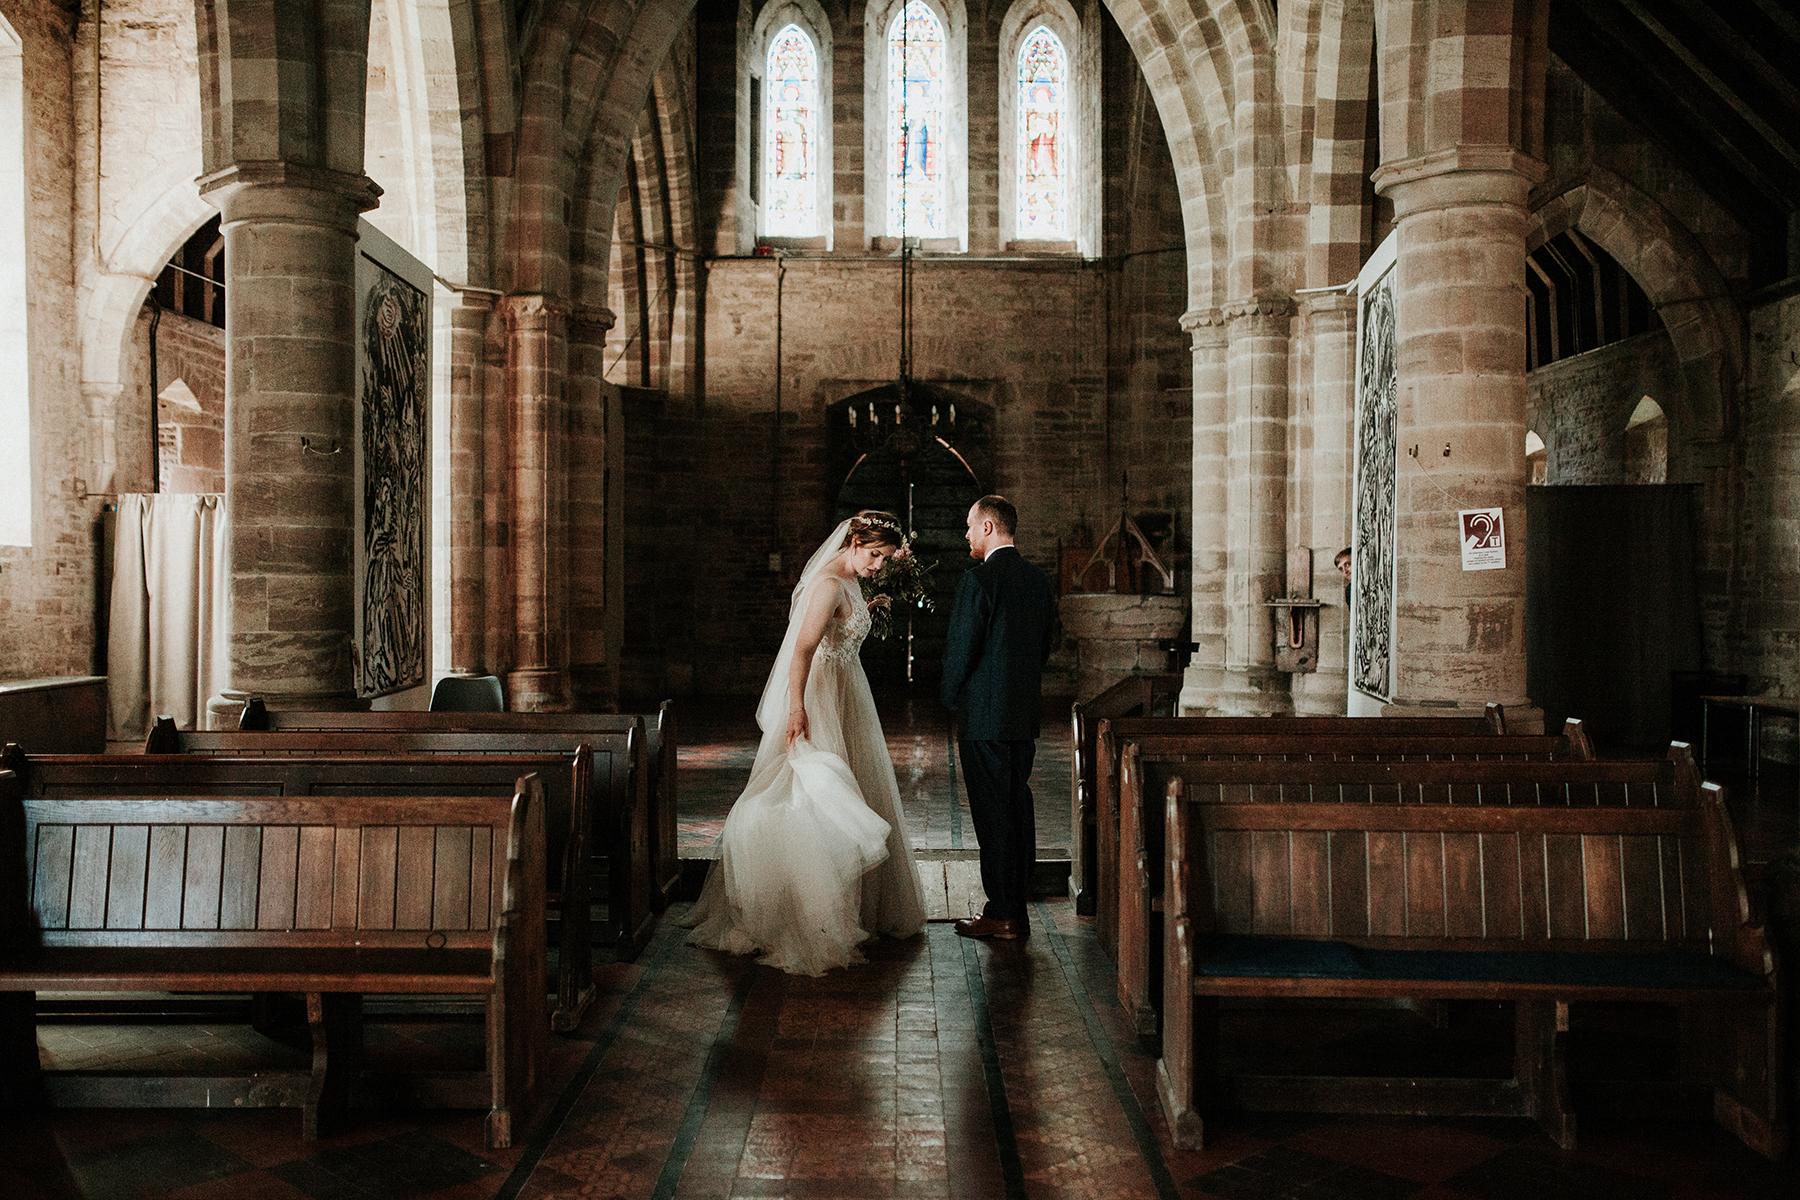 2018 WEDDING GIVEAWAY WINNERS: TABITHA + ASH- HEREFORDSHIRE, UK